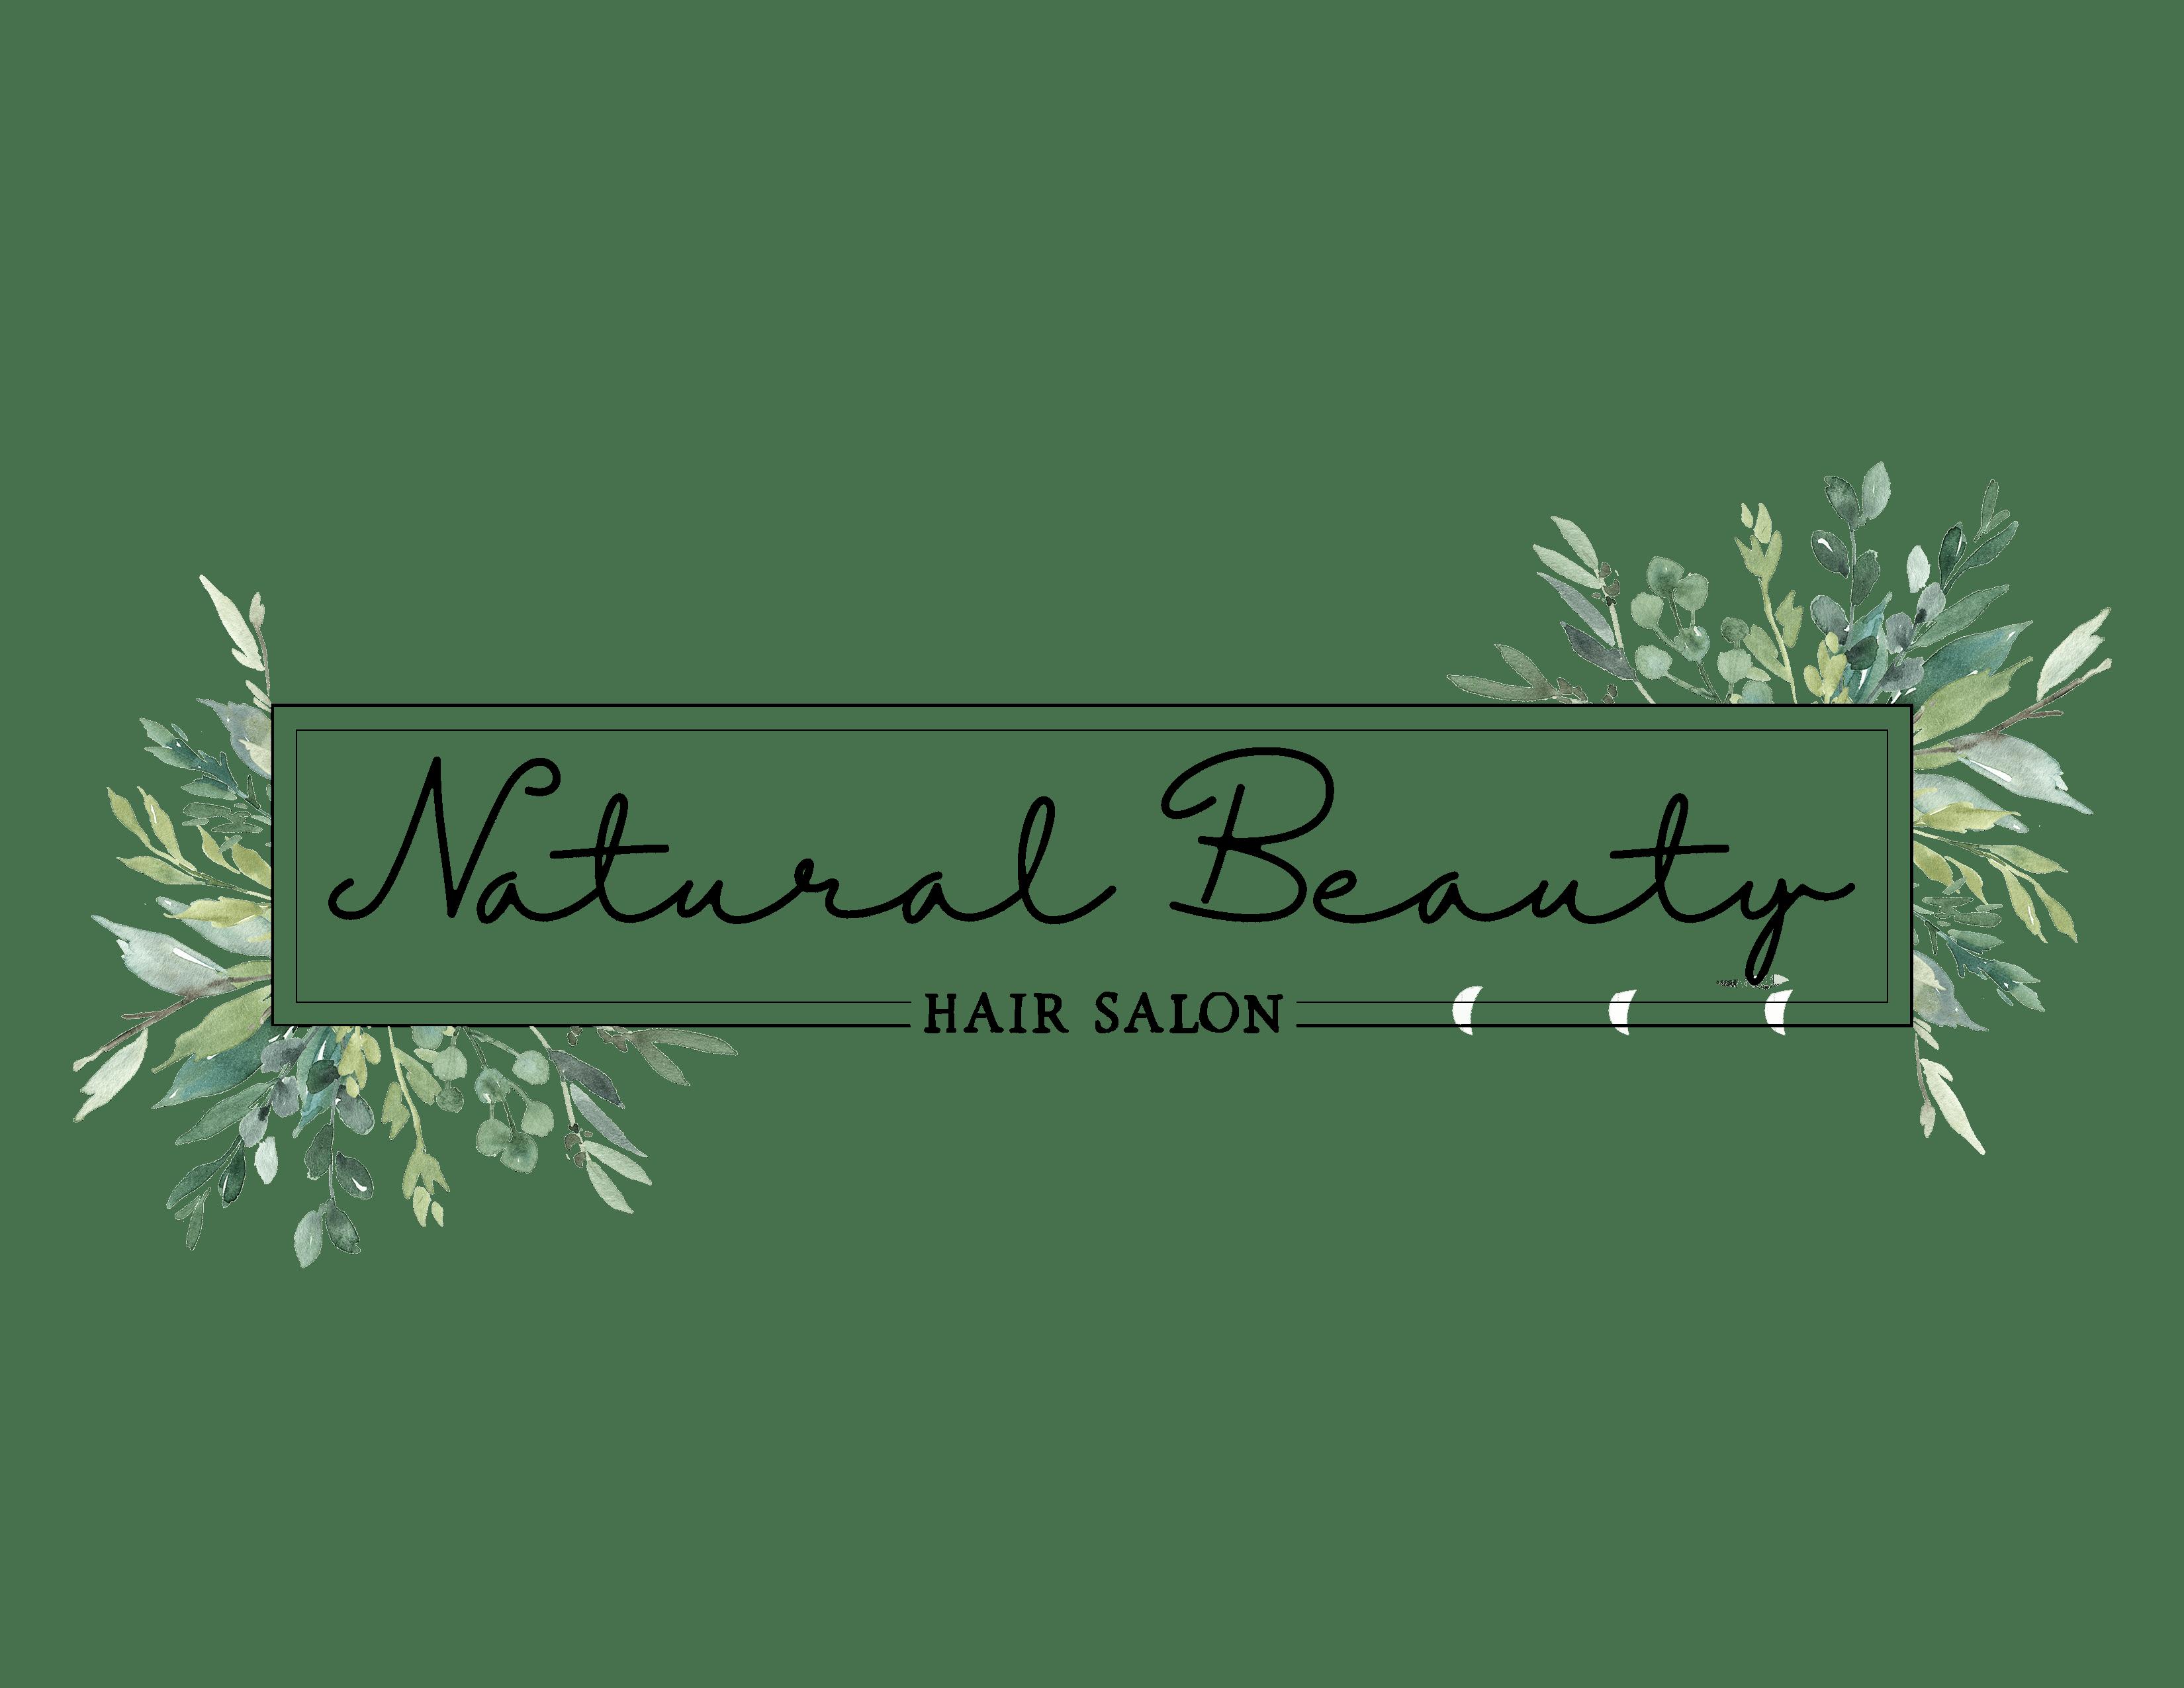 Natural Beauty Hair Salon